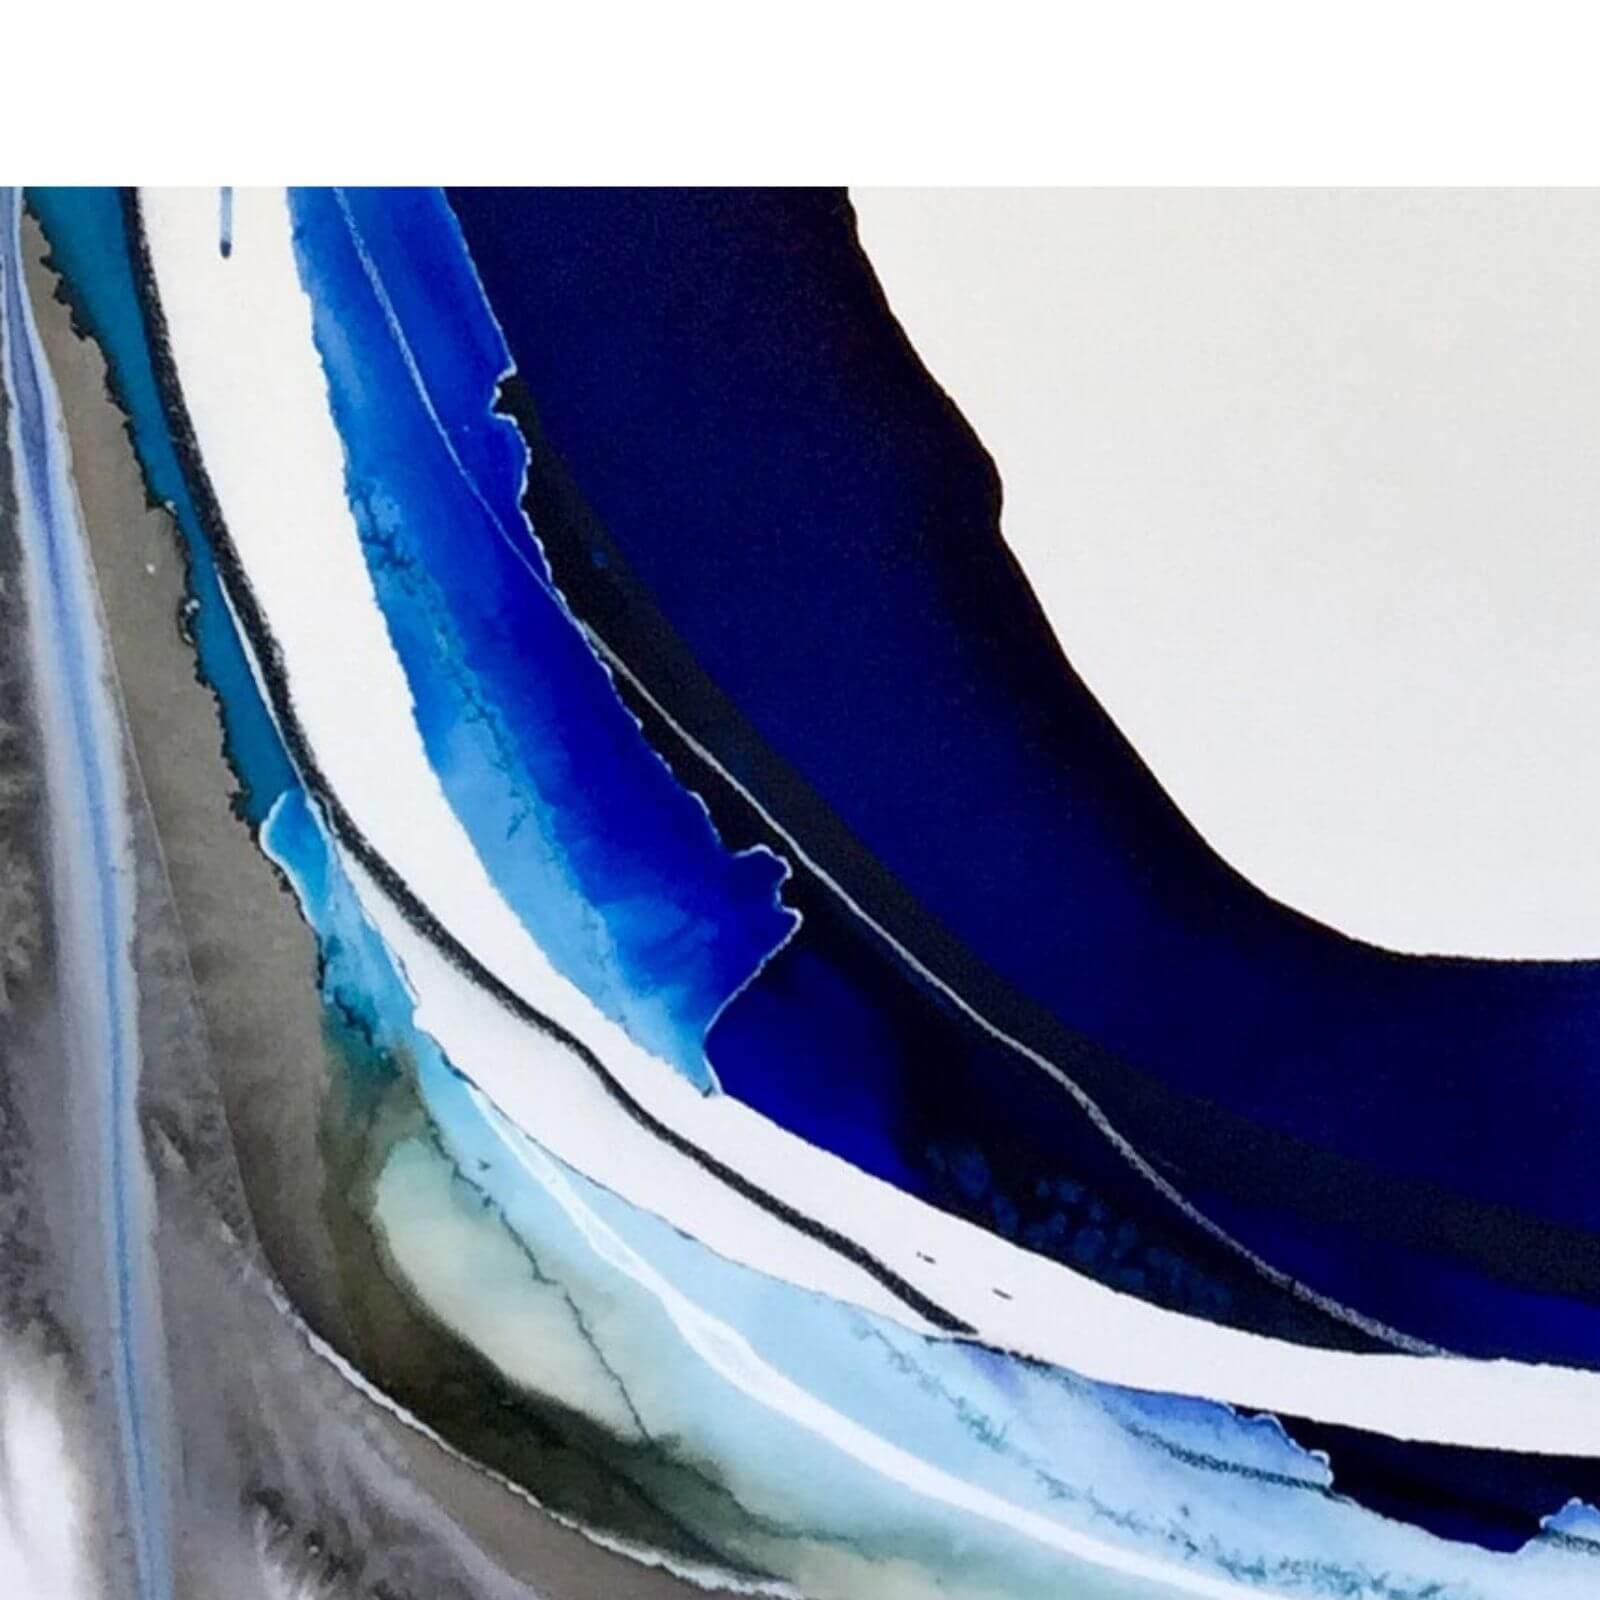 Lara Scolari Bleu Bolt 1 contemporary art work